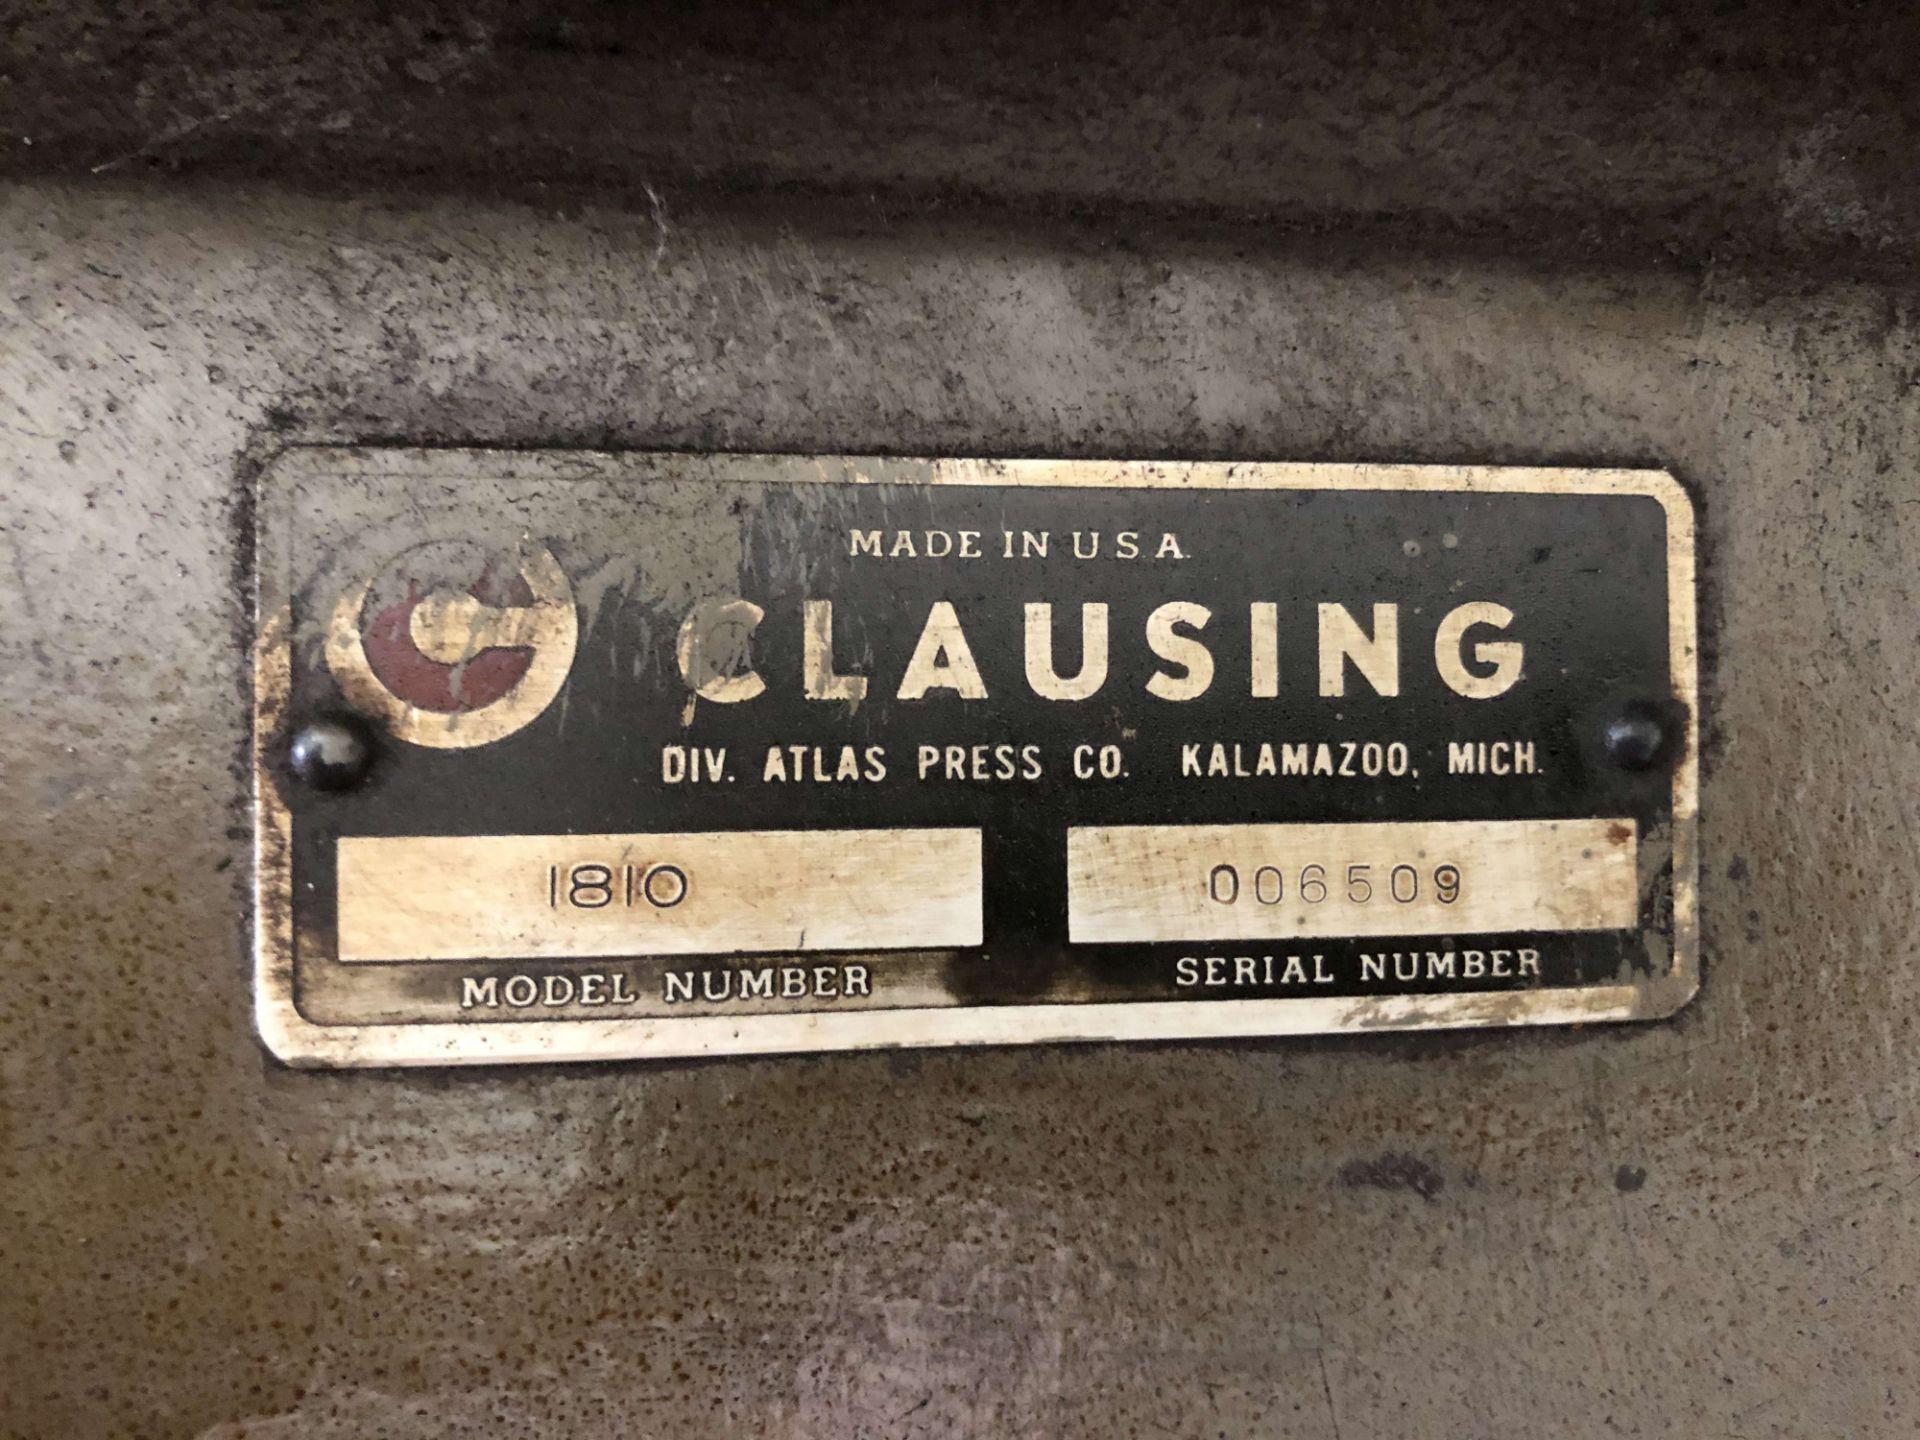 Lot 4 - Clausing Floor Drill Press, Model 1810, S/N 006509